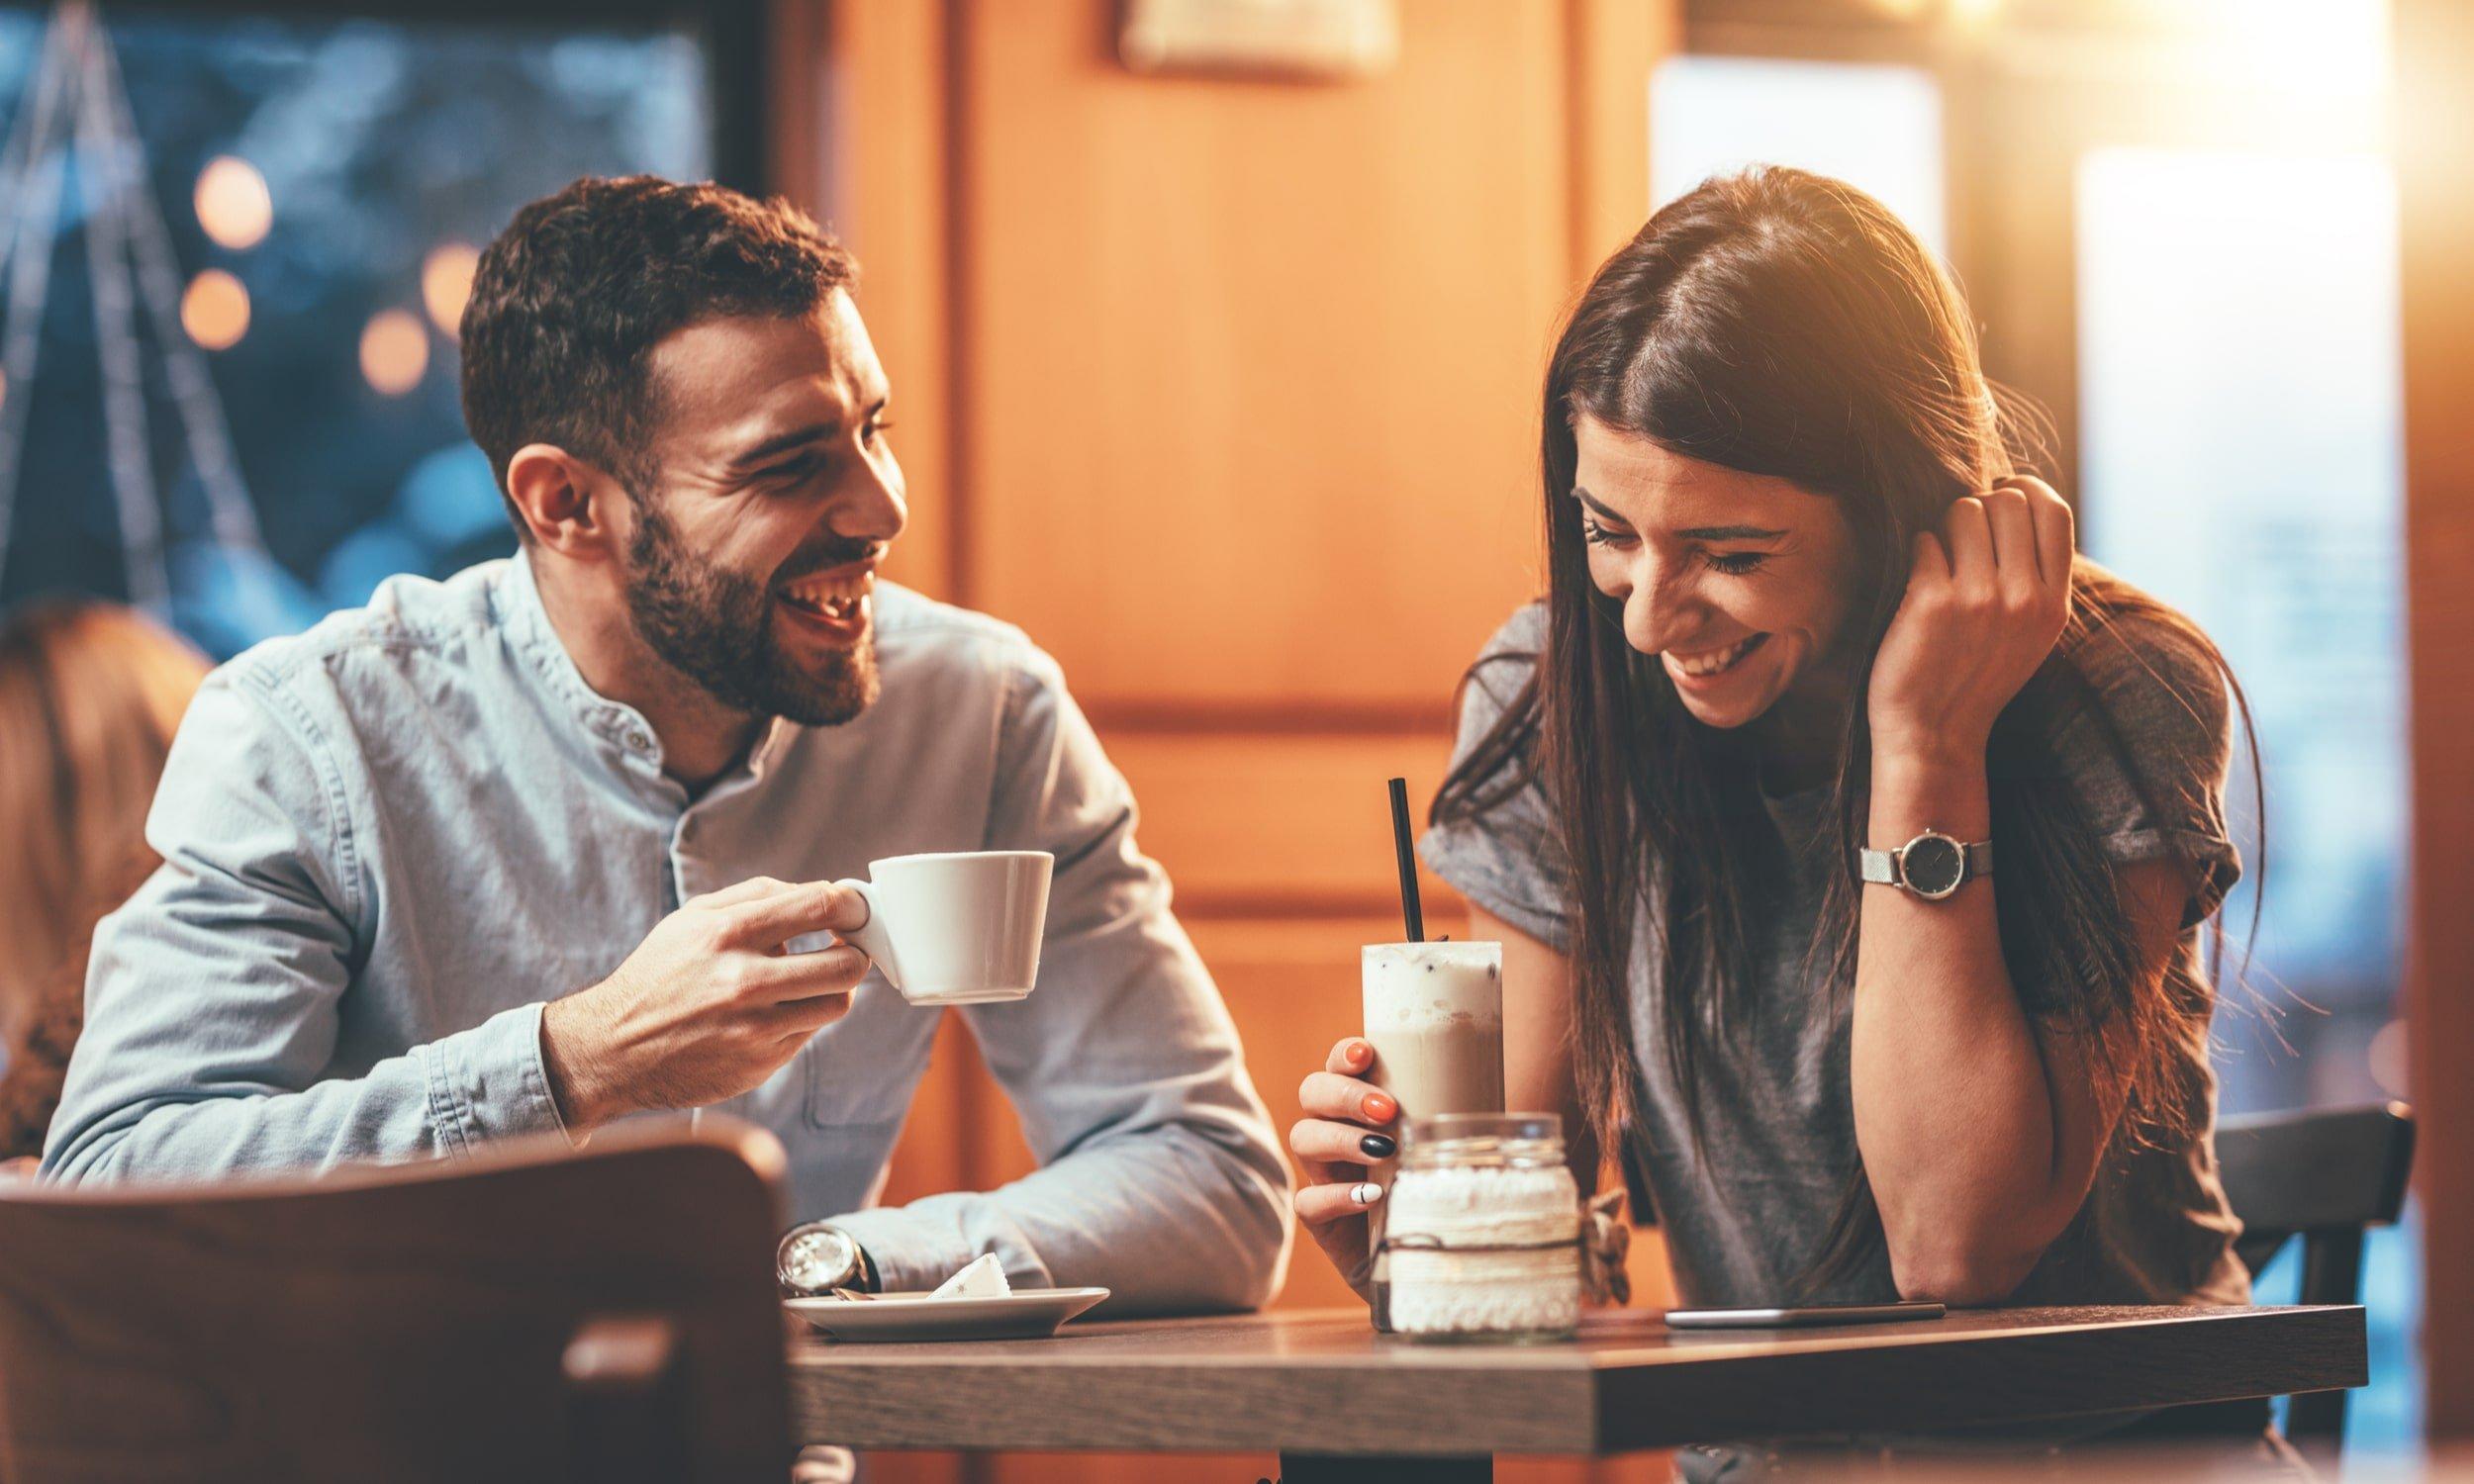 pora kavineje geria kava pasimatyme